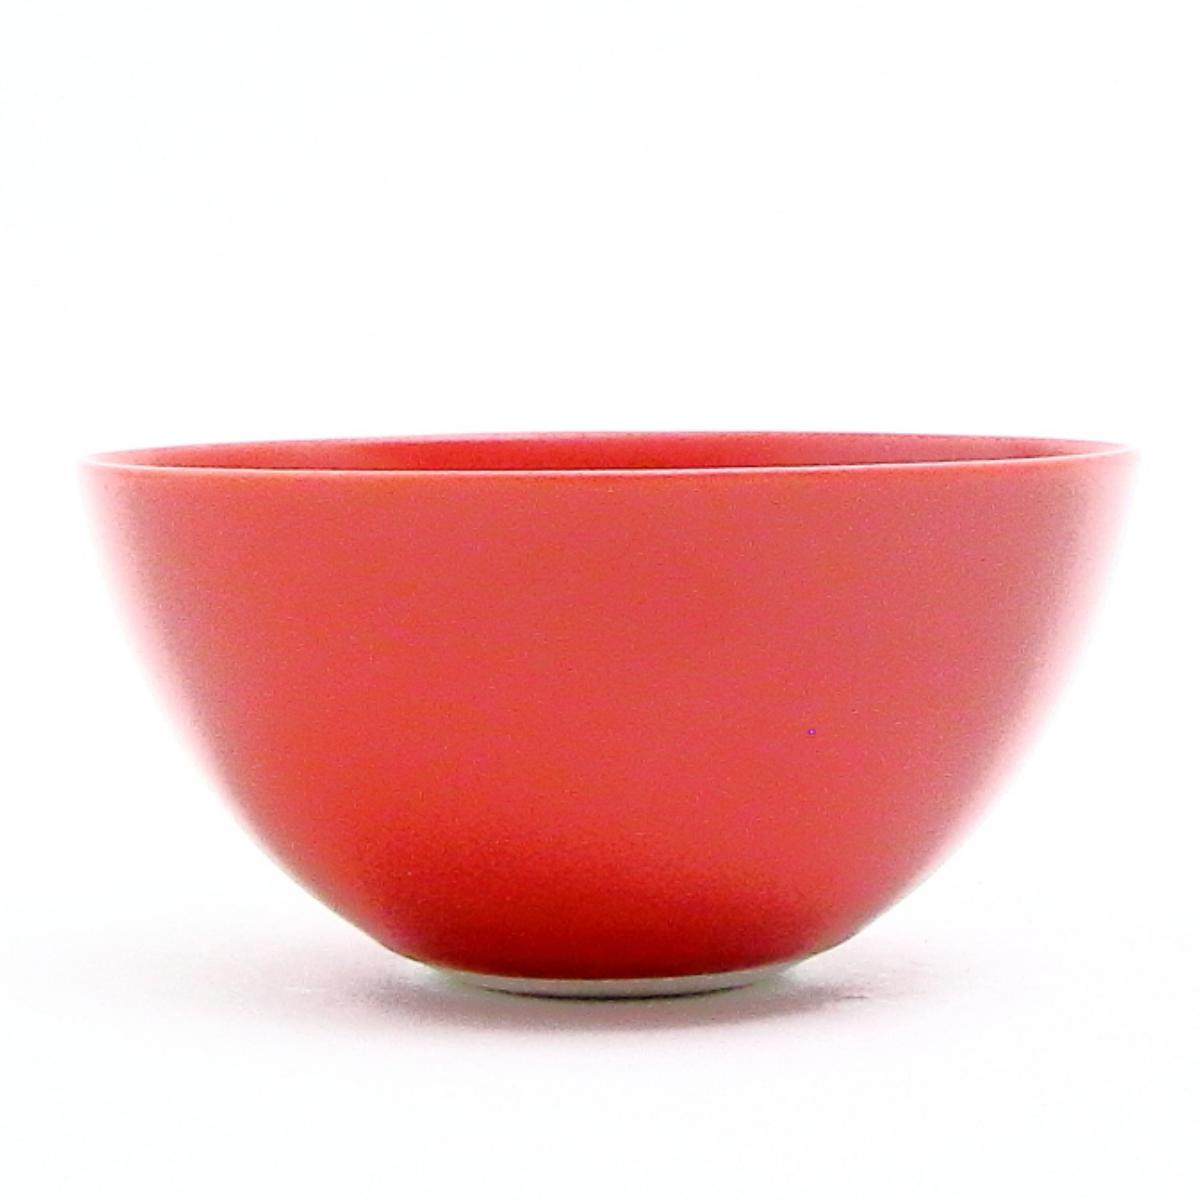 Bowl S ローズレッド 詳細画像1